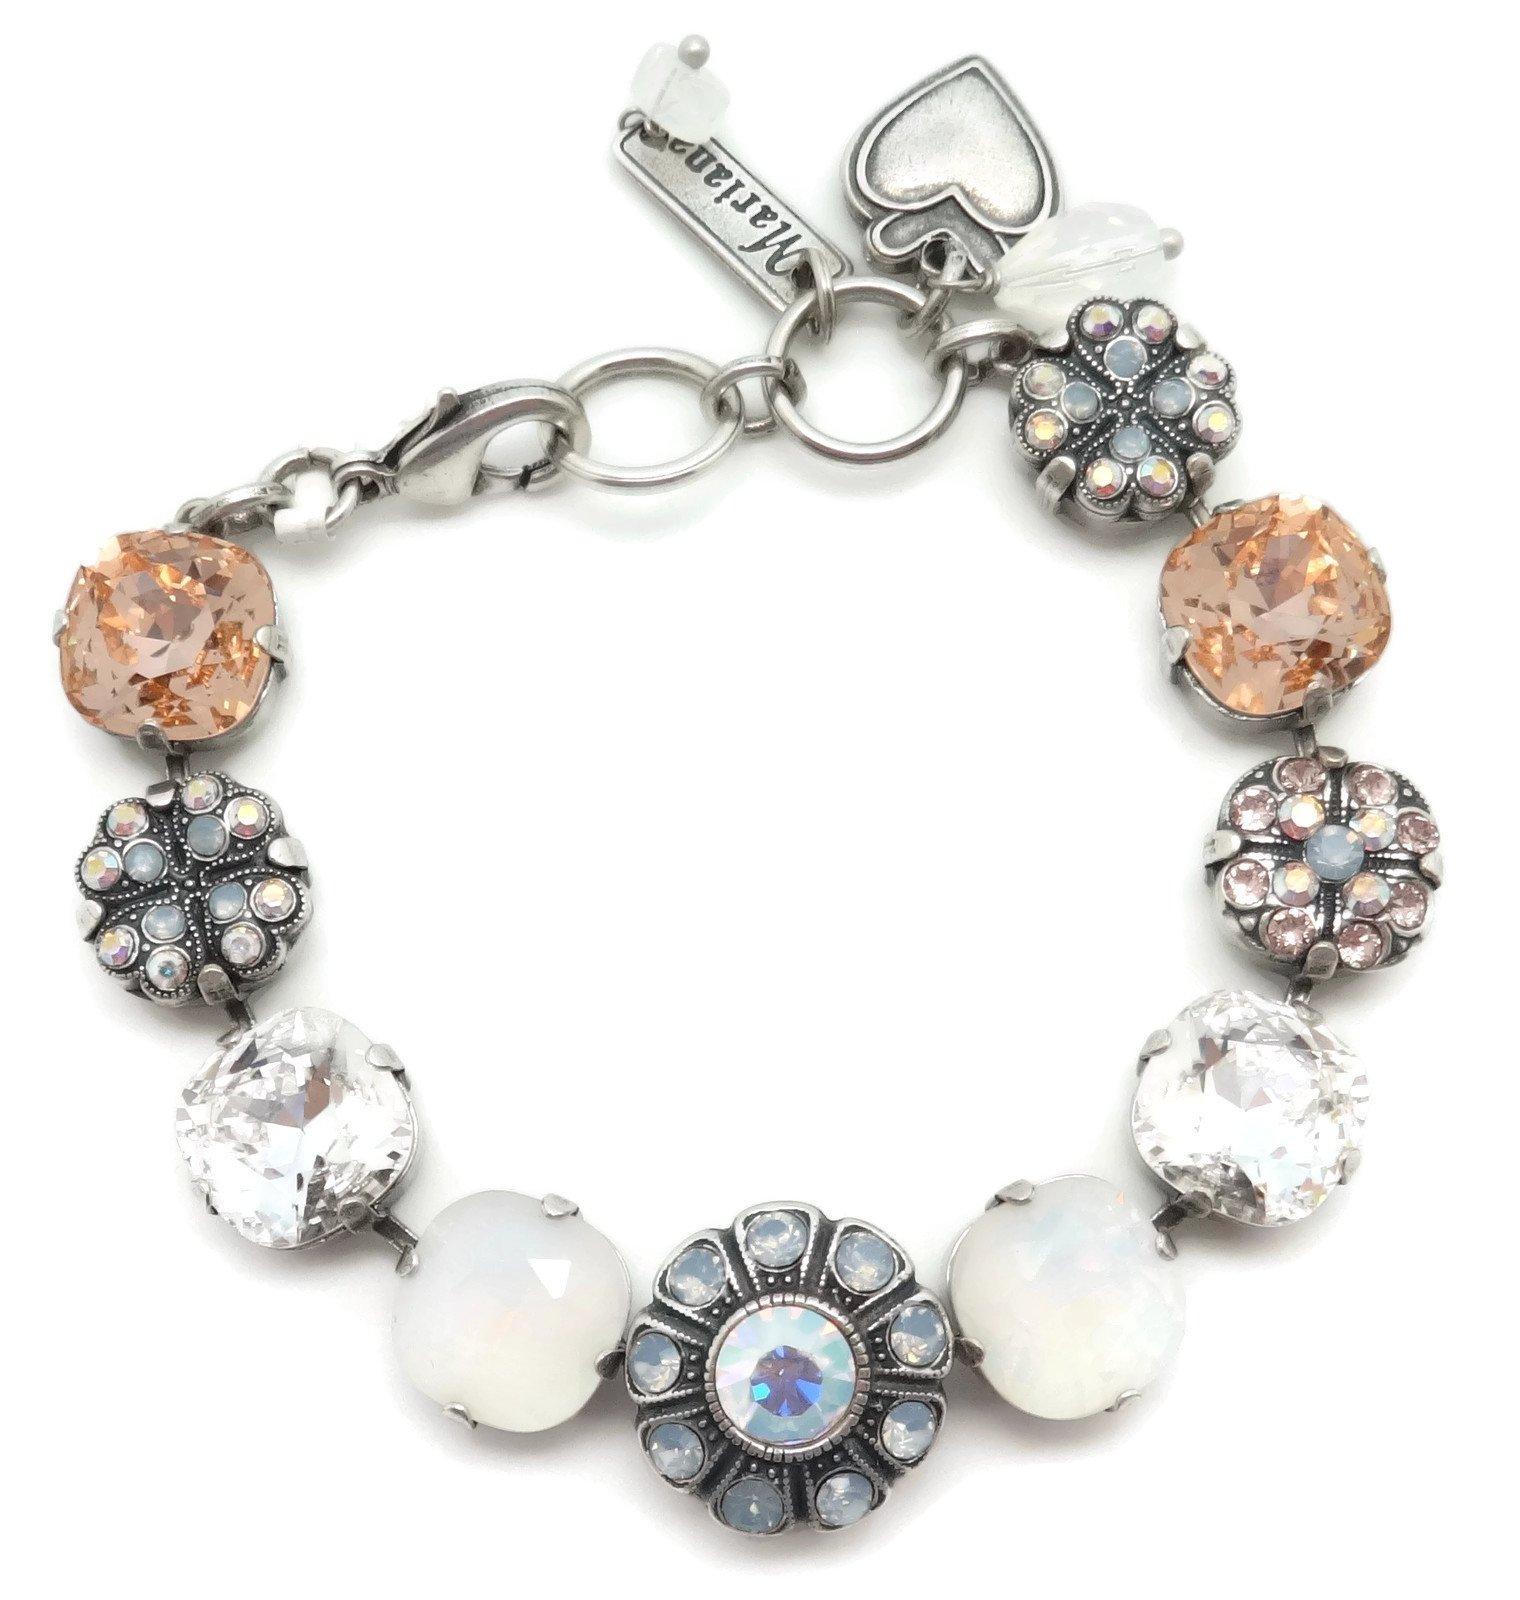 Mariana Swarovski Crystal Silver Plated Bracelet Blue White Peach Cushion Cut Mosaic 1055 Cosmo